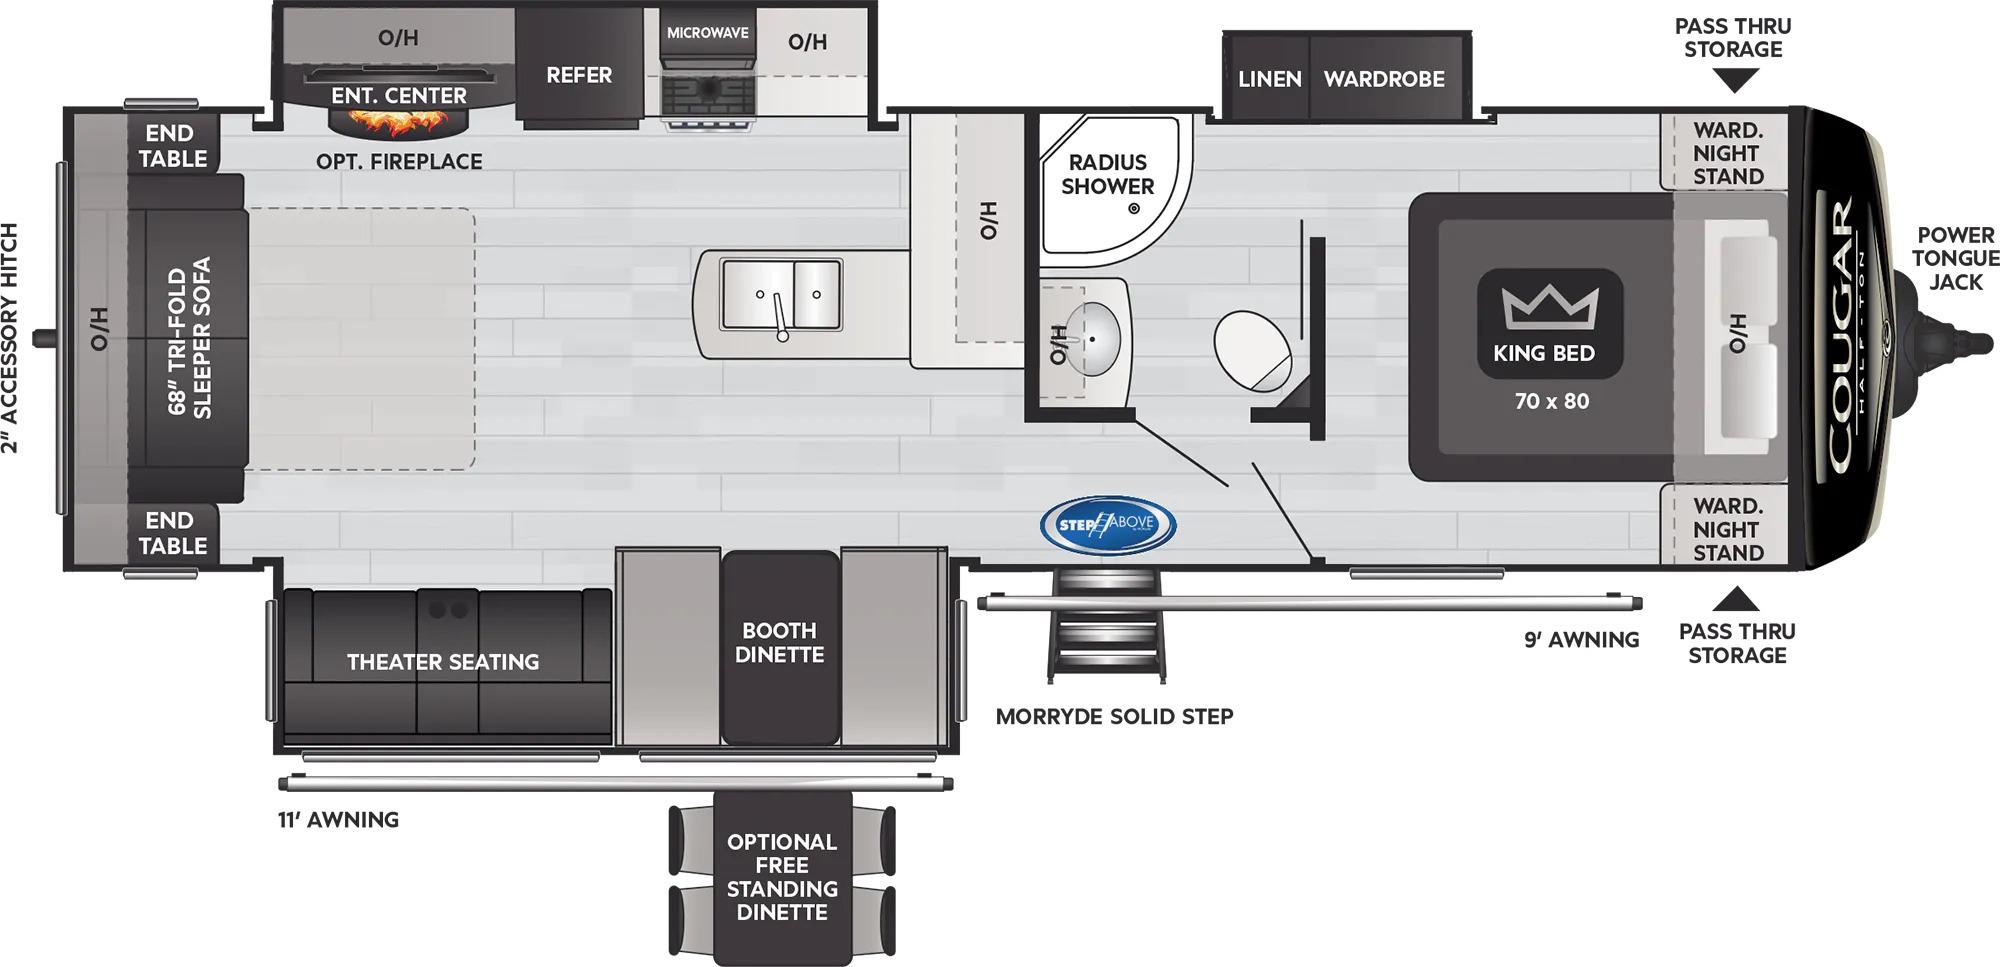 View Floor Plan for 2022 KEYSTONE COUGAR 29RLSWE